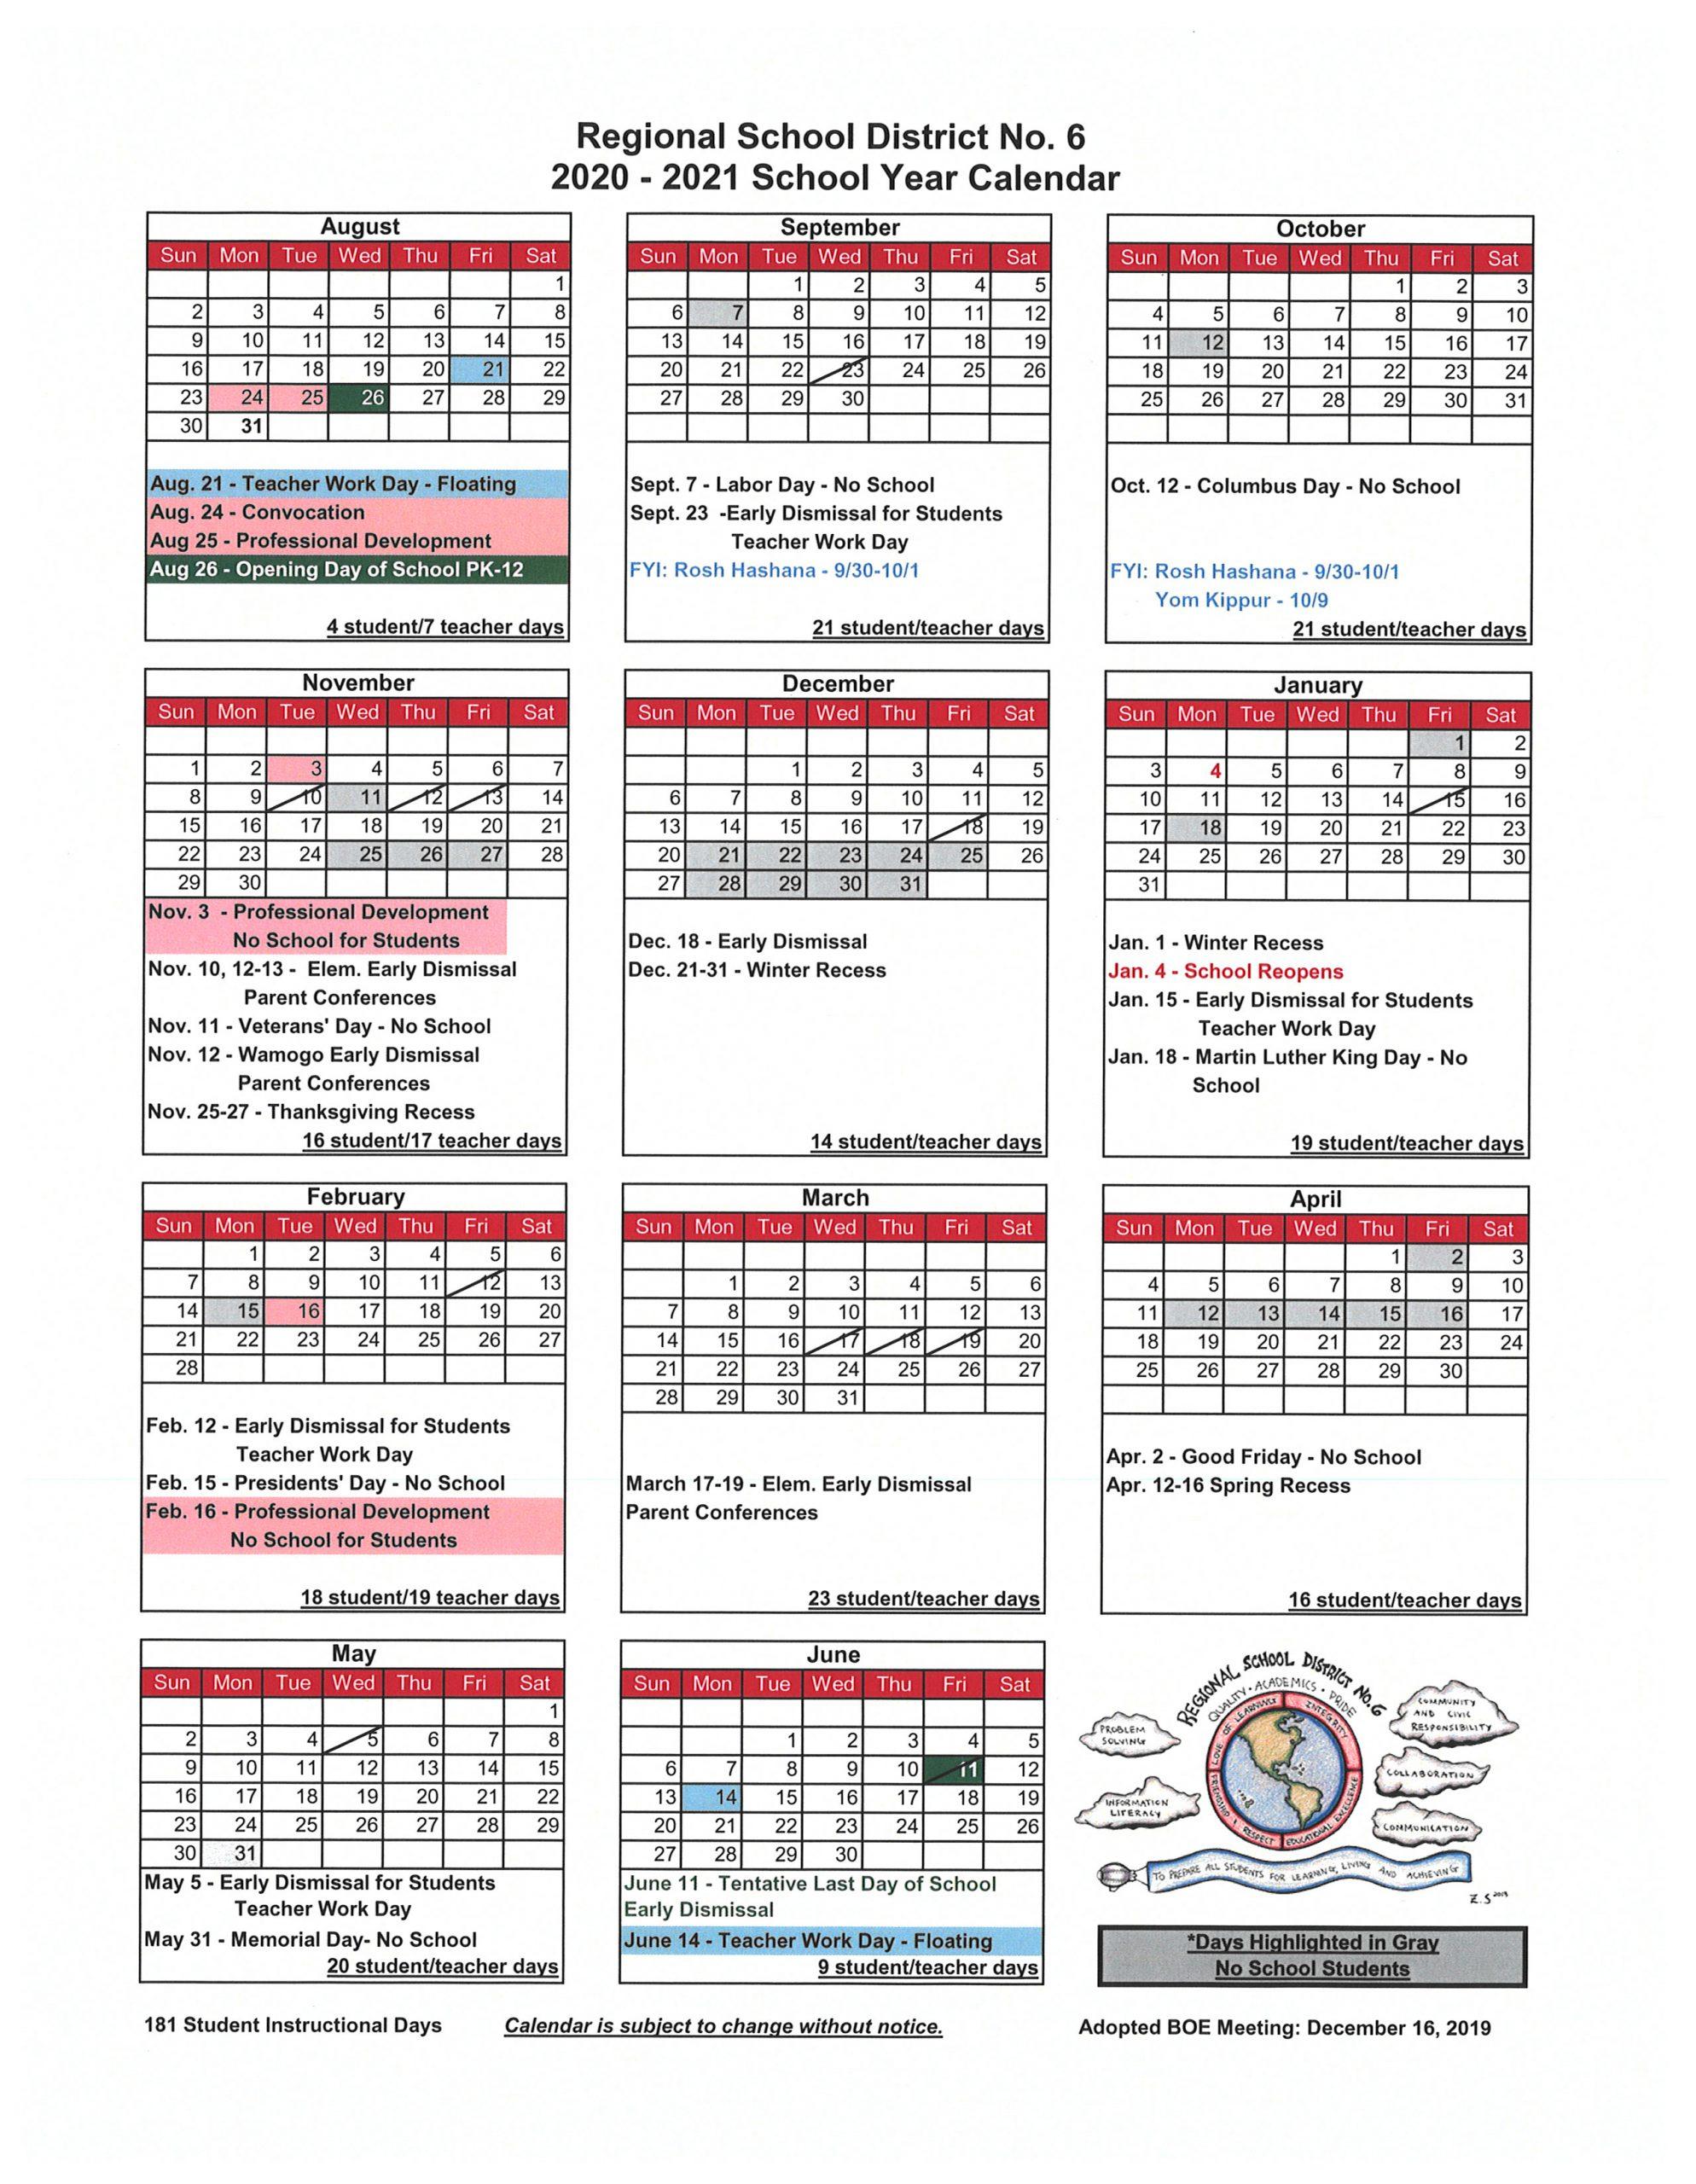 Full Sail University Calendar | Printable Calendar 2020-2021 inside San Marcos University Ca 2020 School Calender